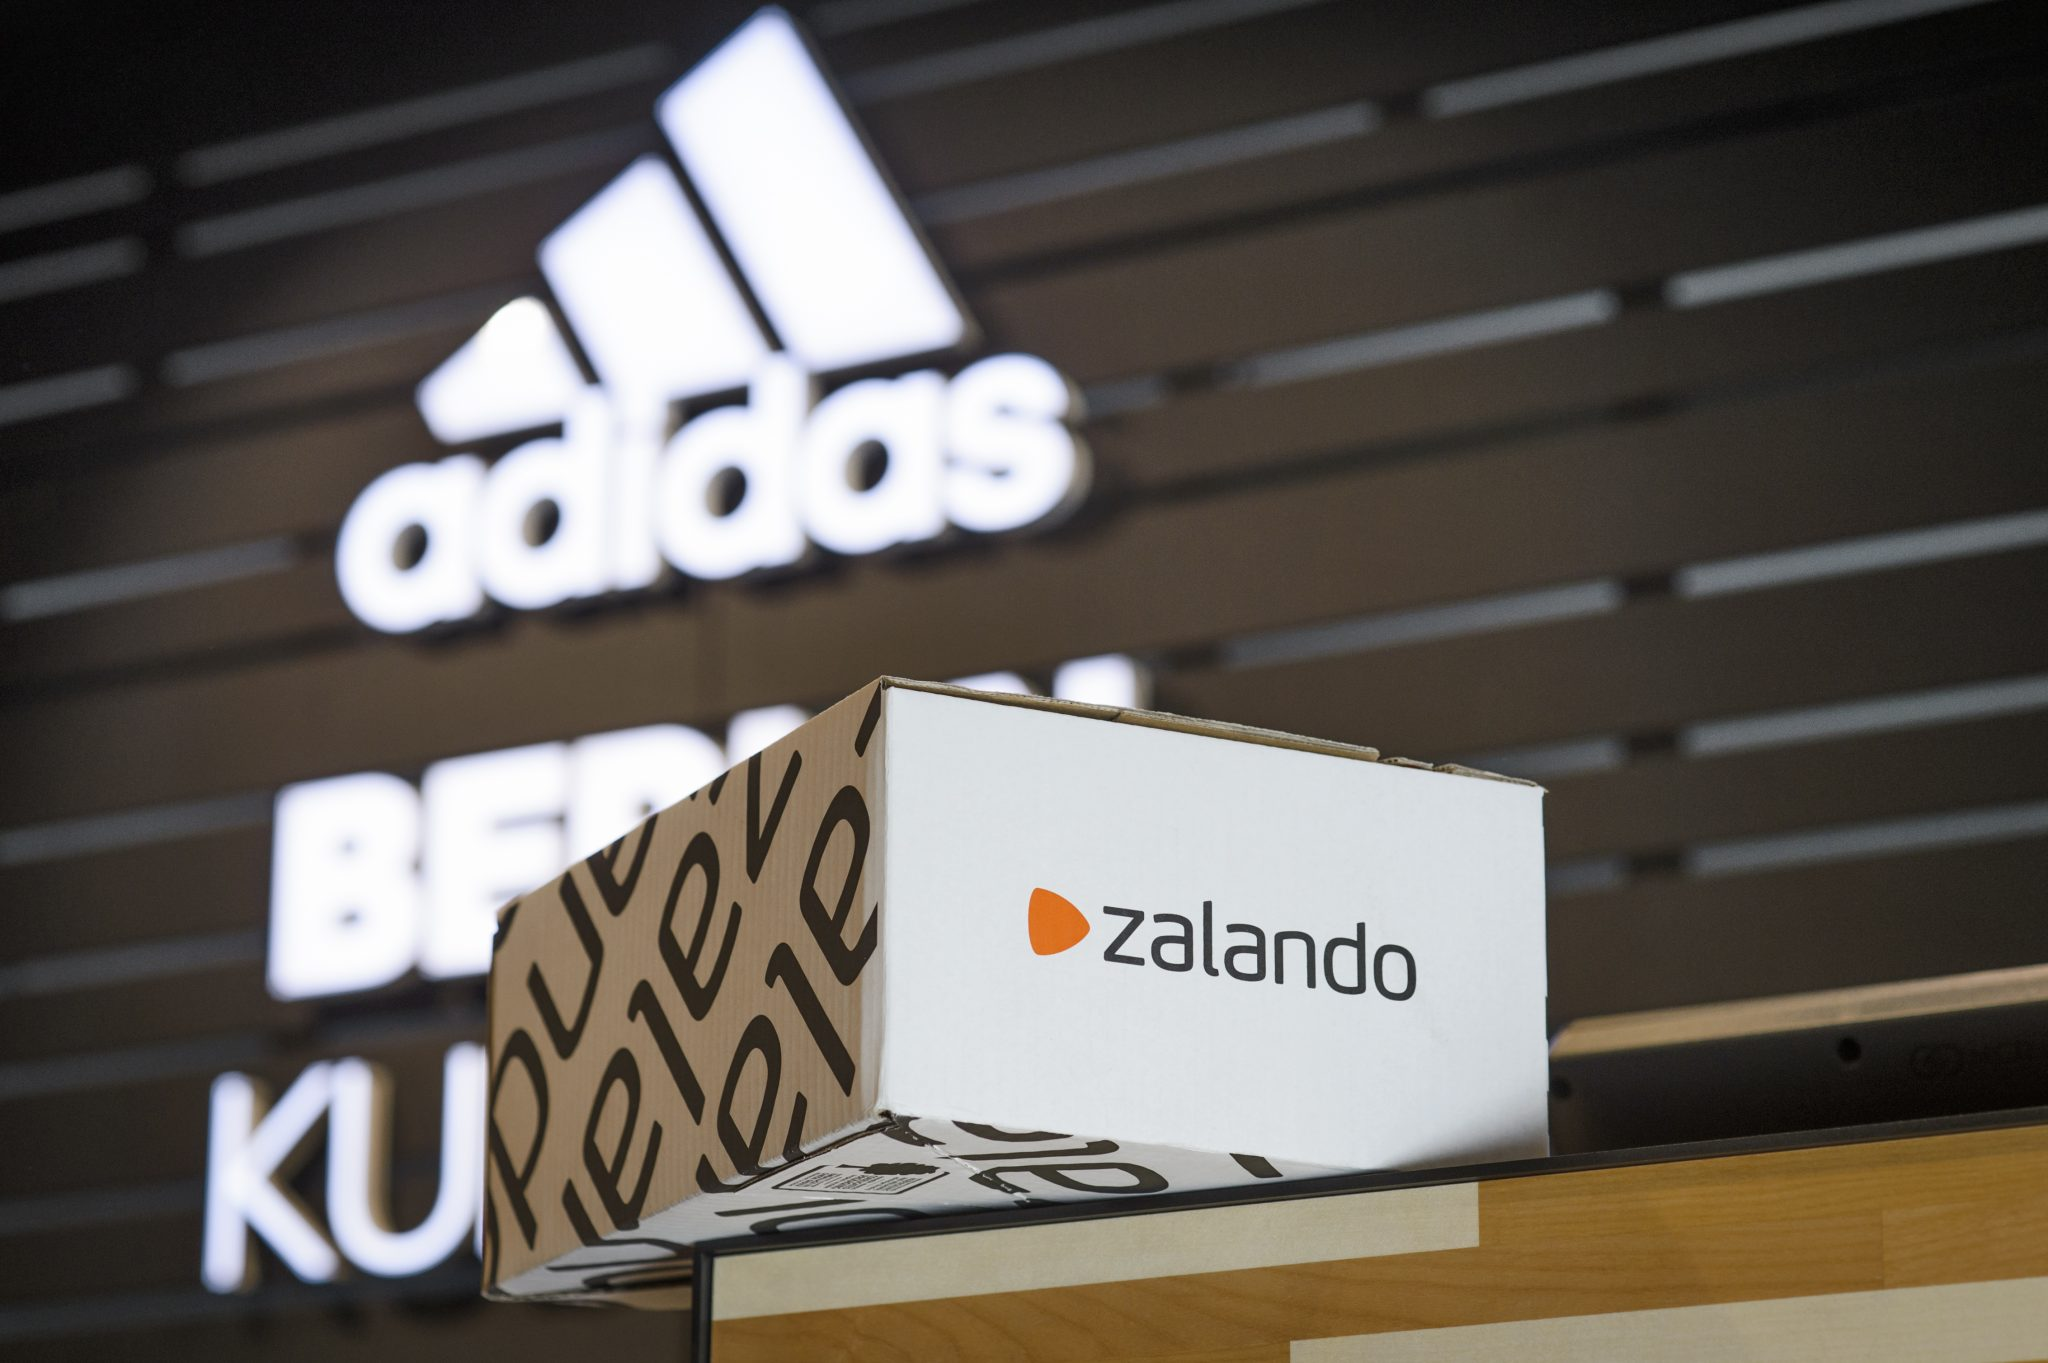 Zalando / Adidas Paket Shooting am 06.06.2016 © Zalando / Claudius Pflug